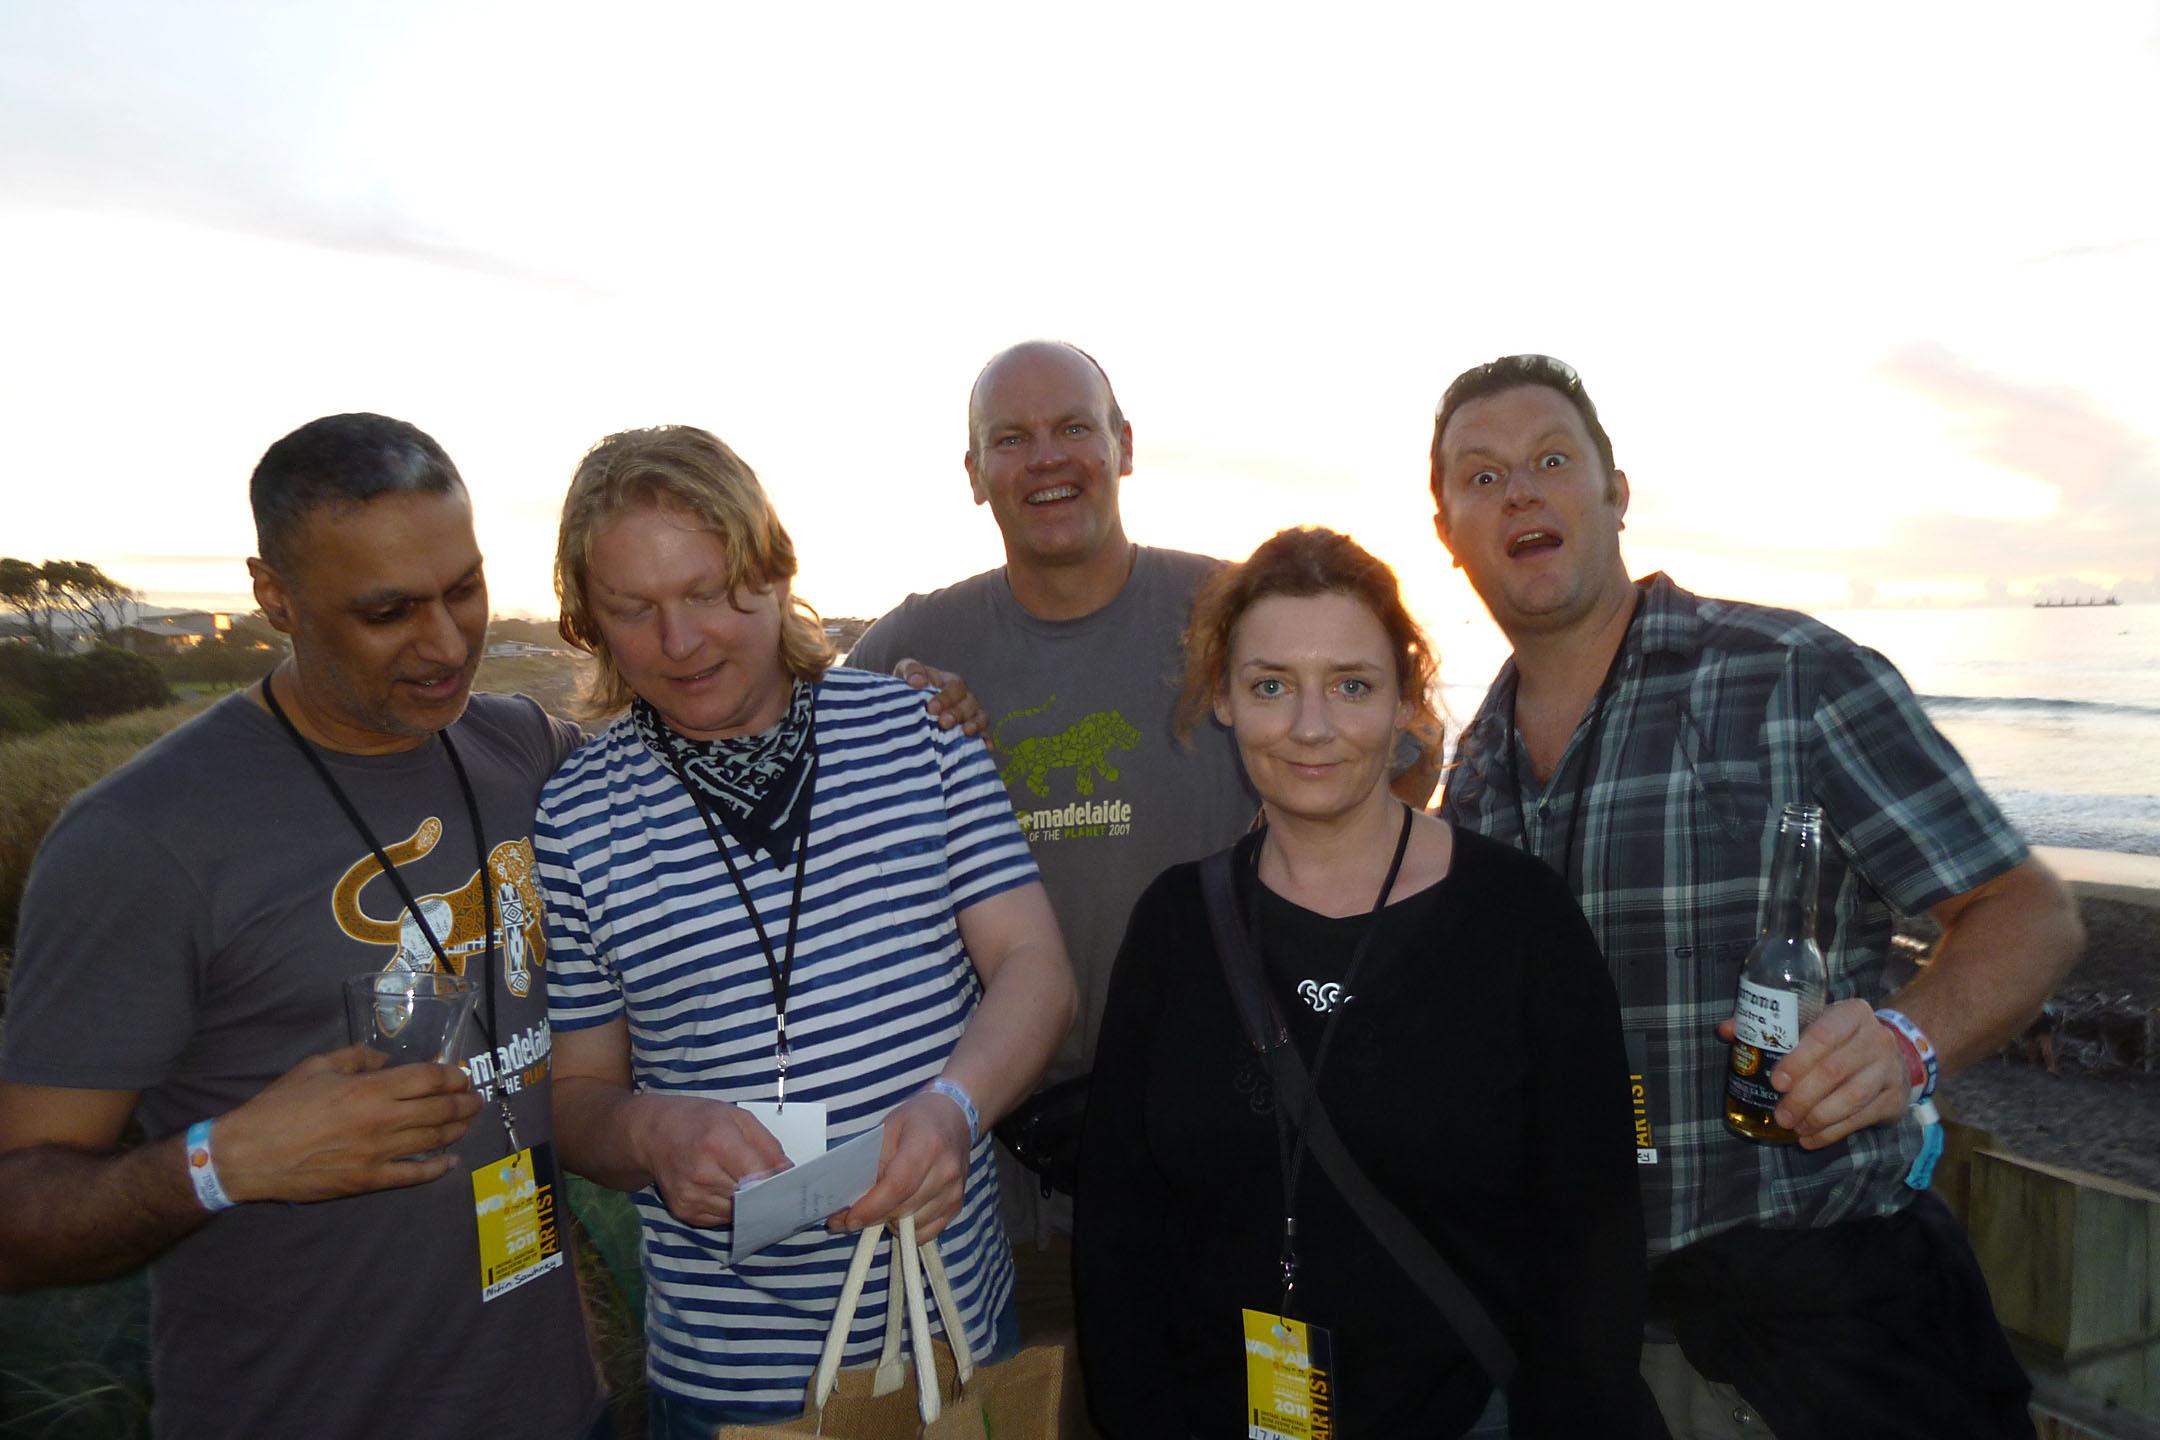 Nitin_Uwe-17Hippies_Philip_17Hippies_David_20110316_New_Plymouth_NZ.jpg